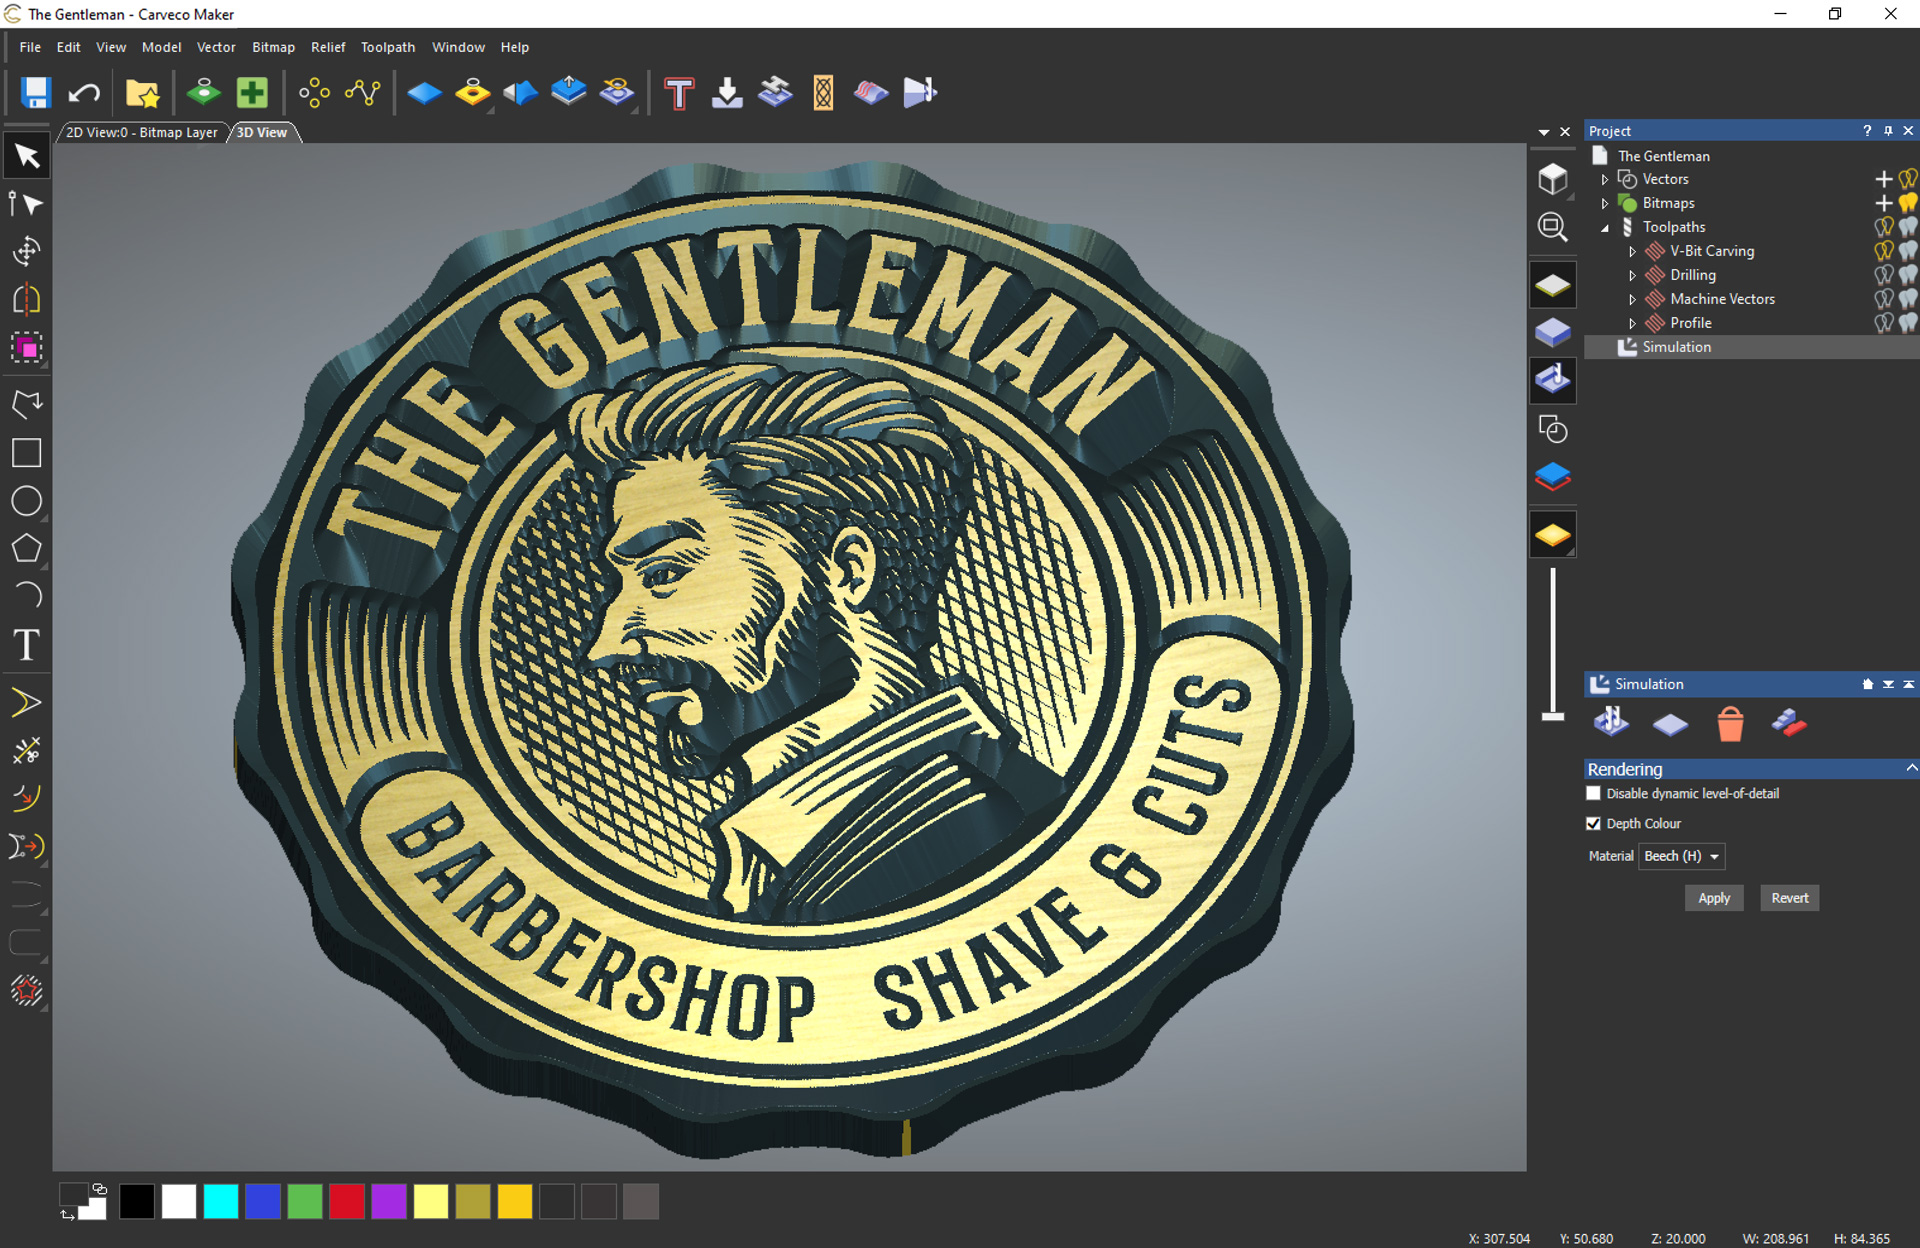 The gentleman - Carveco maker